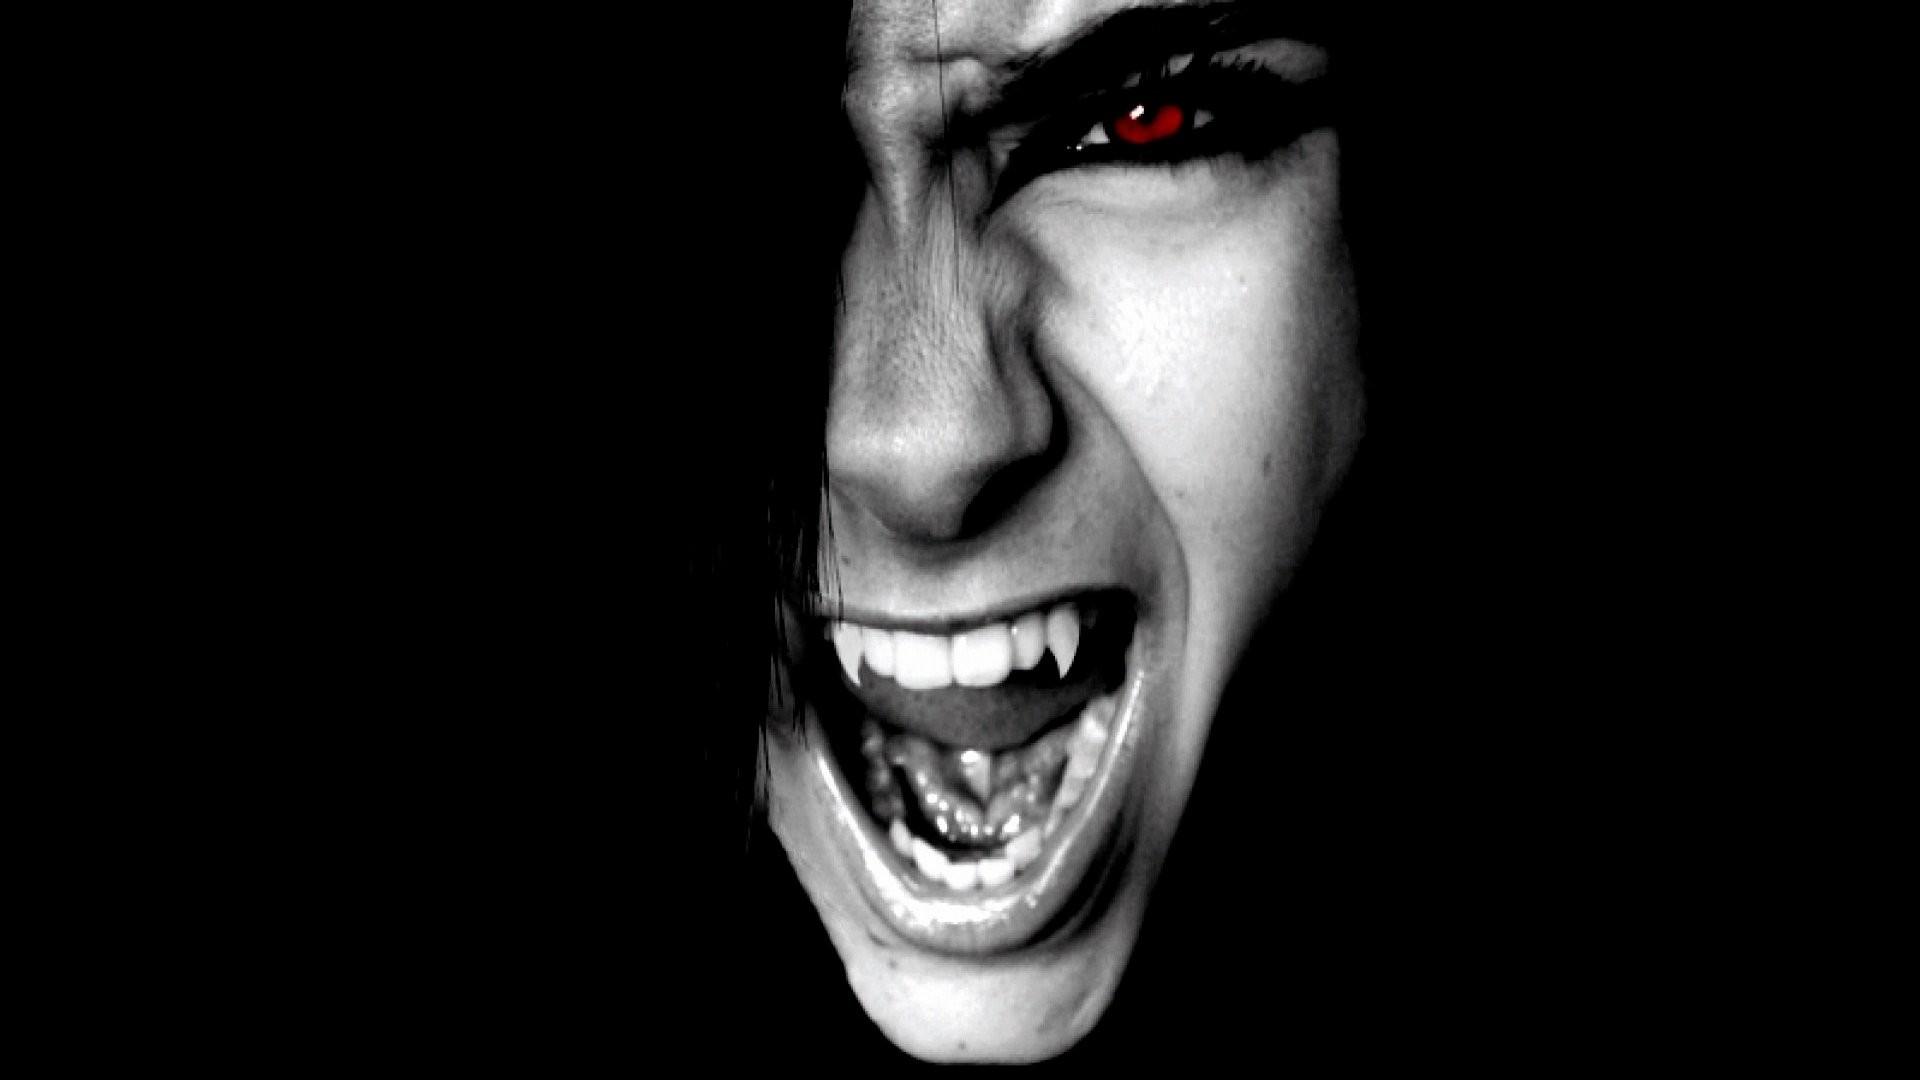 Res: 1920x1080, widescreen, creepy, evil, digital art, horror, backgrounds, scary,dark,  spooky, digital images windows desktop images Wallpaper HD